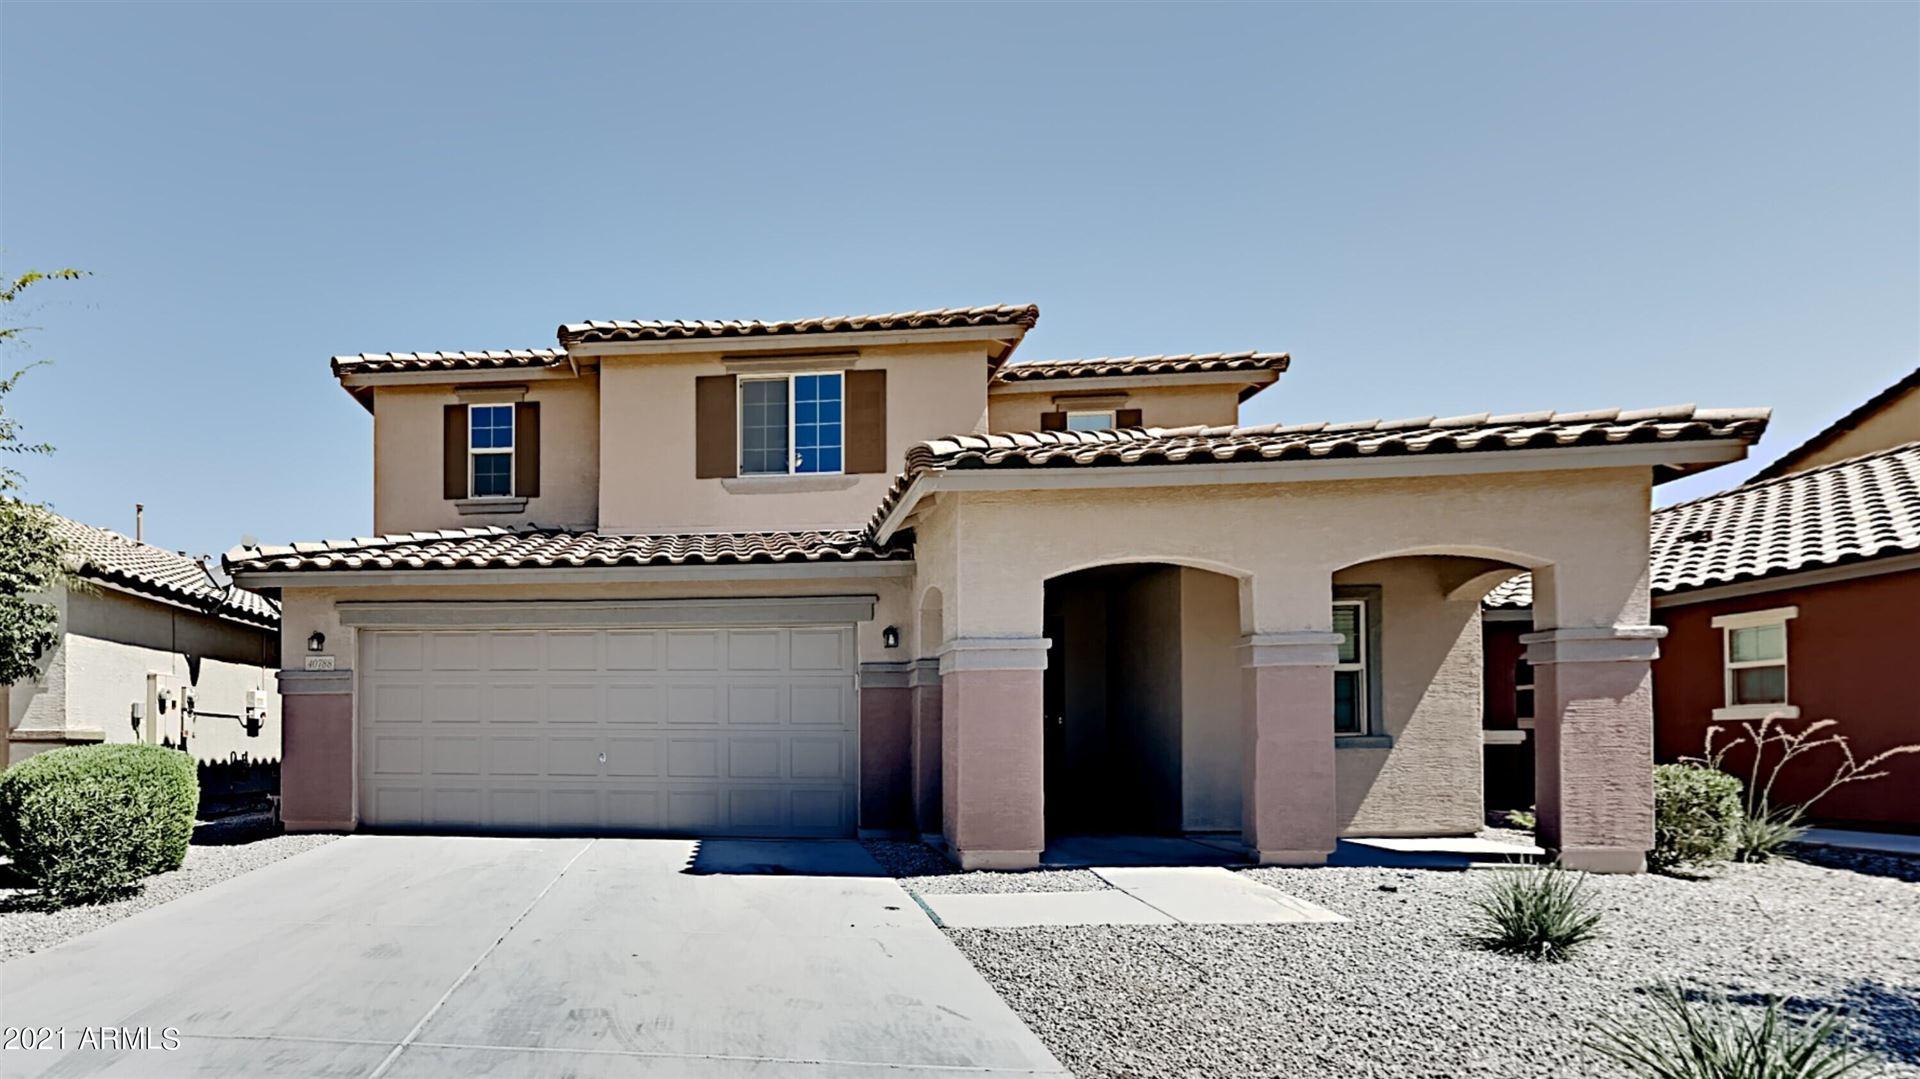 Photo for 40788 W PORTIS Drive, Maricopa, AZ 85138 (MLS # 6254606)